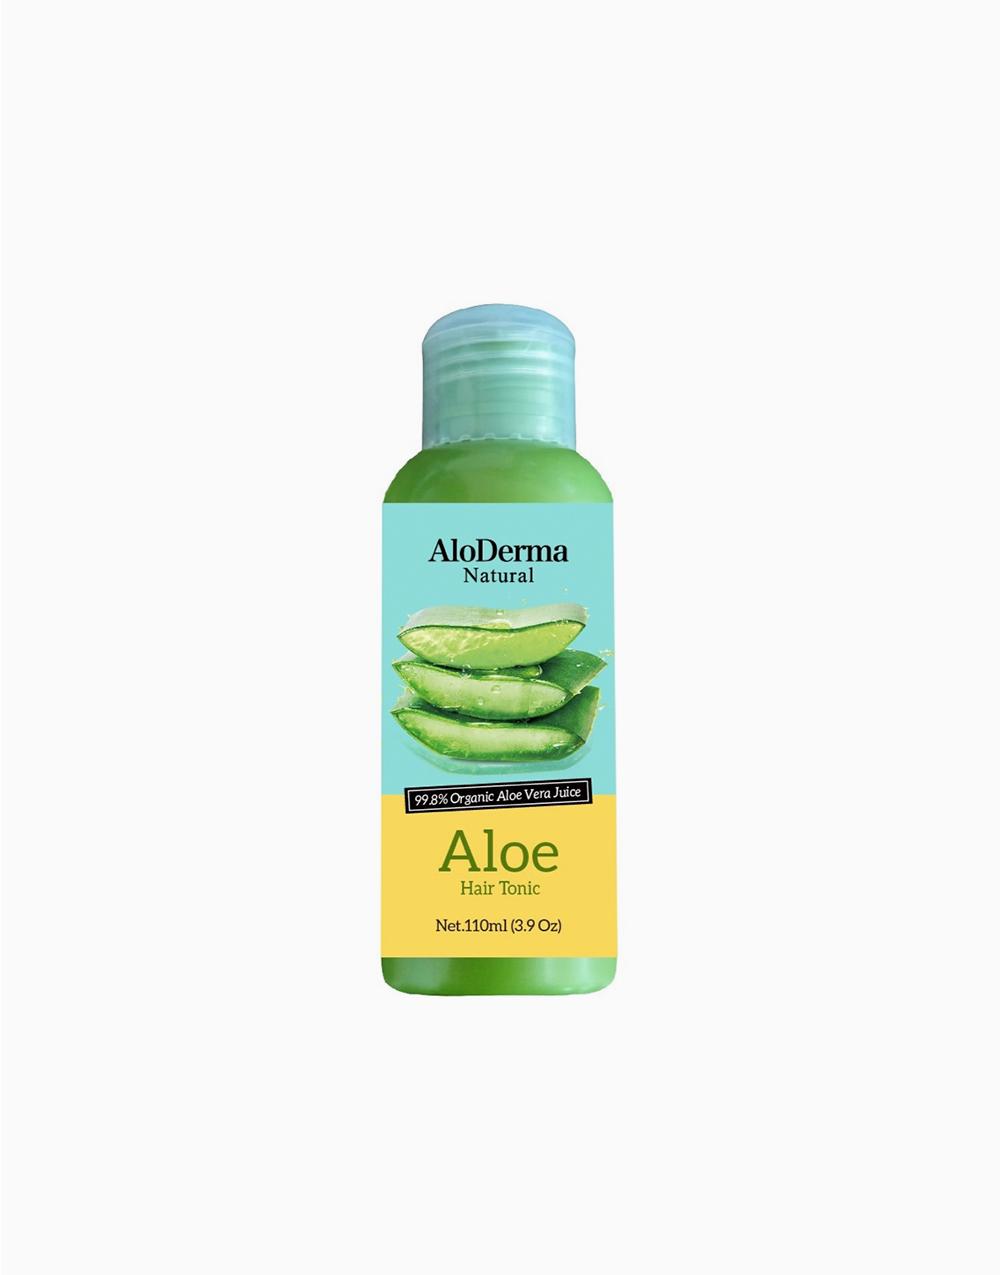 Aloe Hair Tonic (110ml) by Aloderma